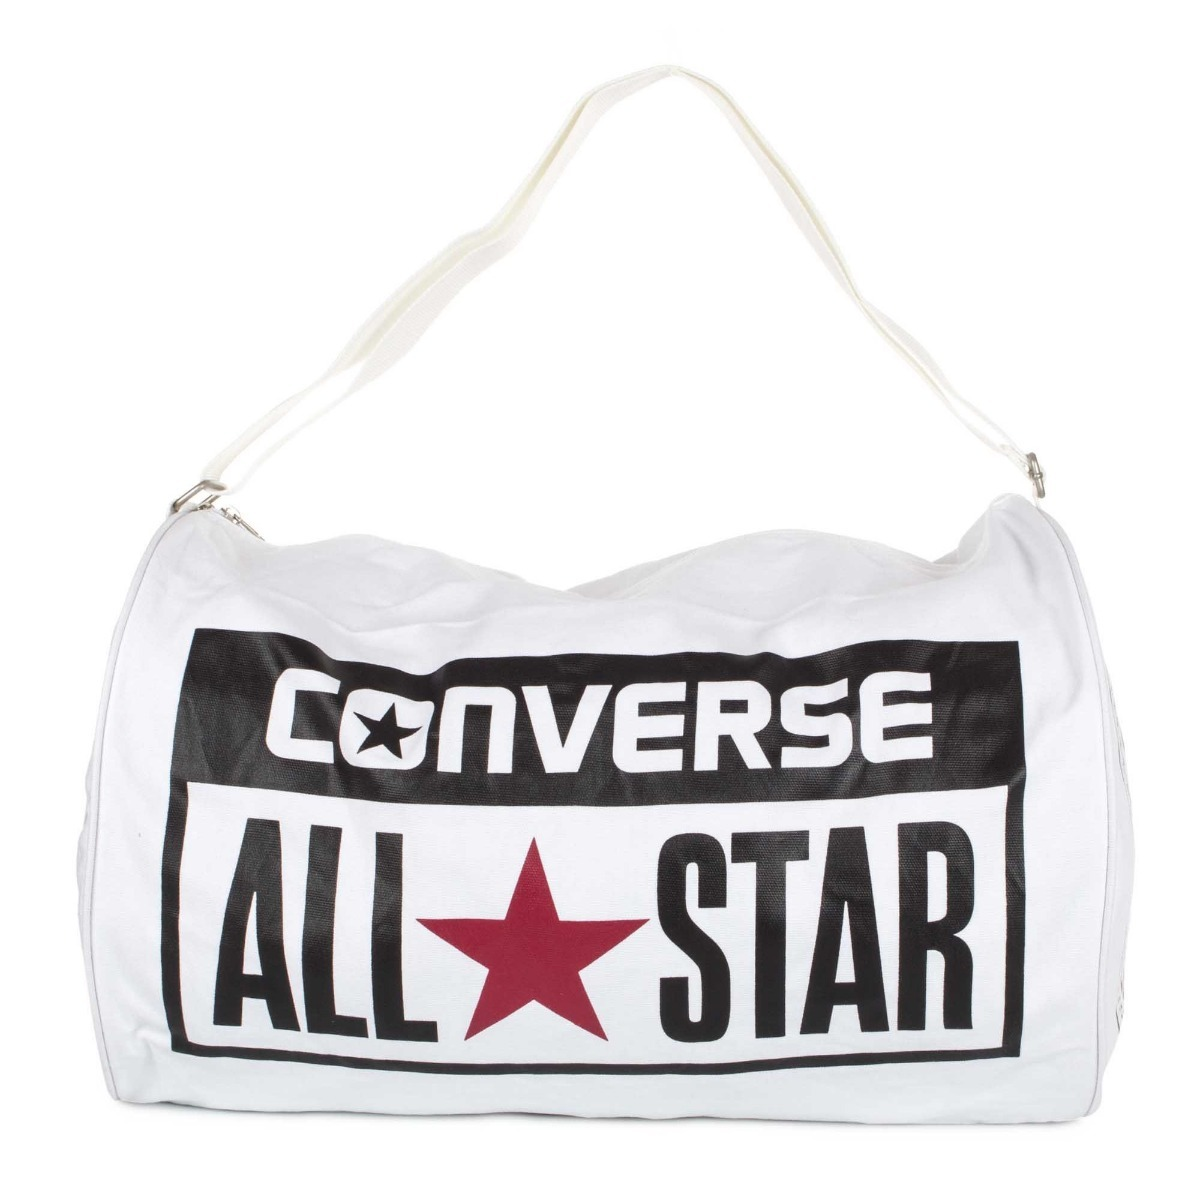 Cargando zoom converse mochila bolso blanco 10422c002 xIPATZ